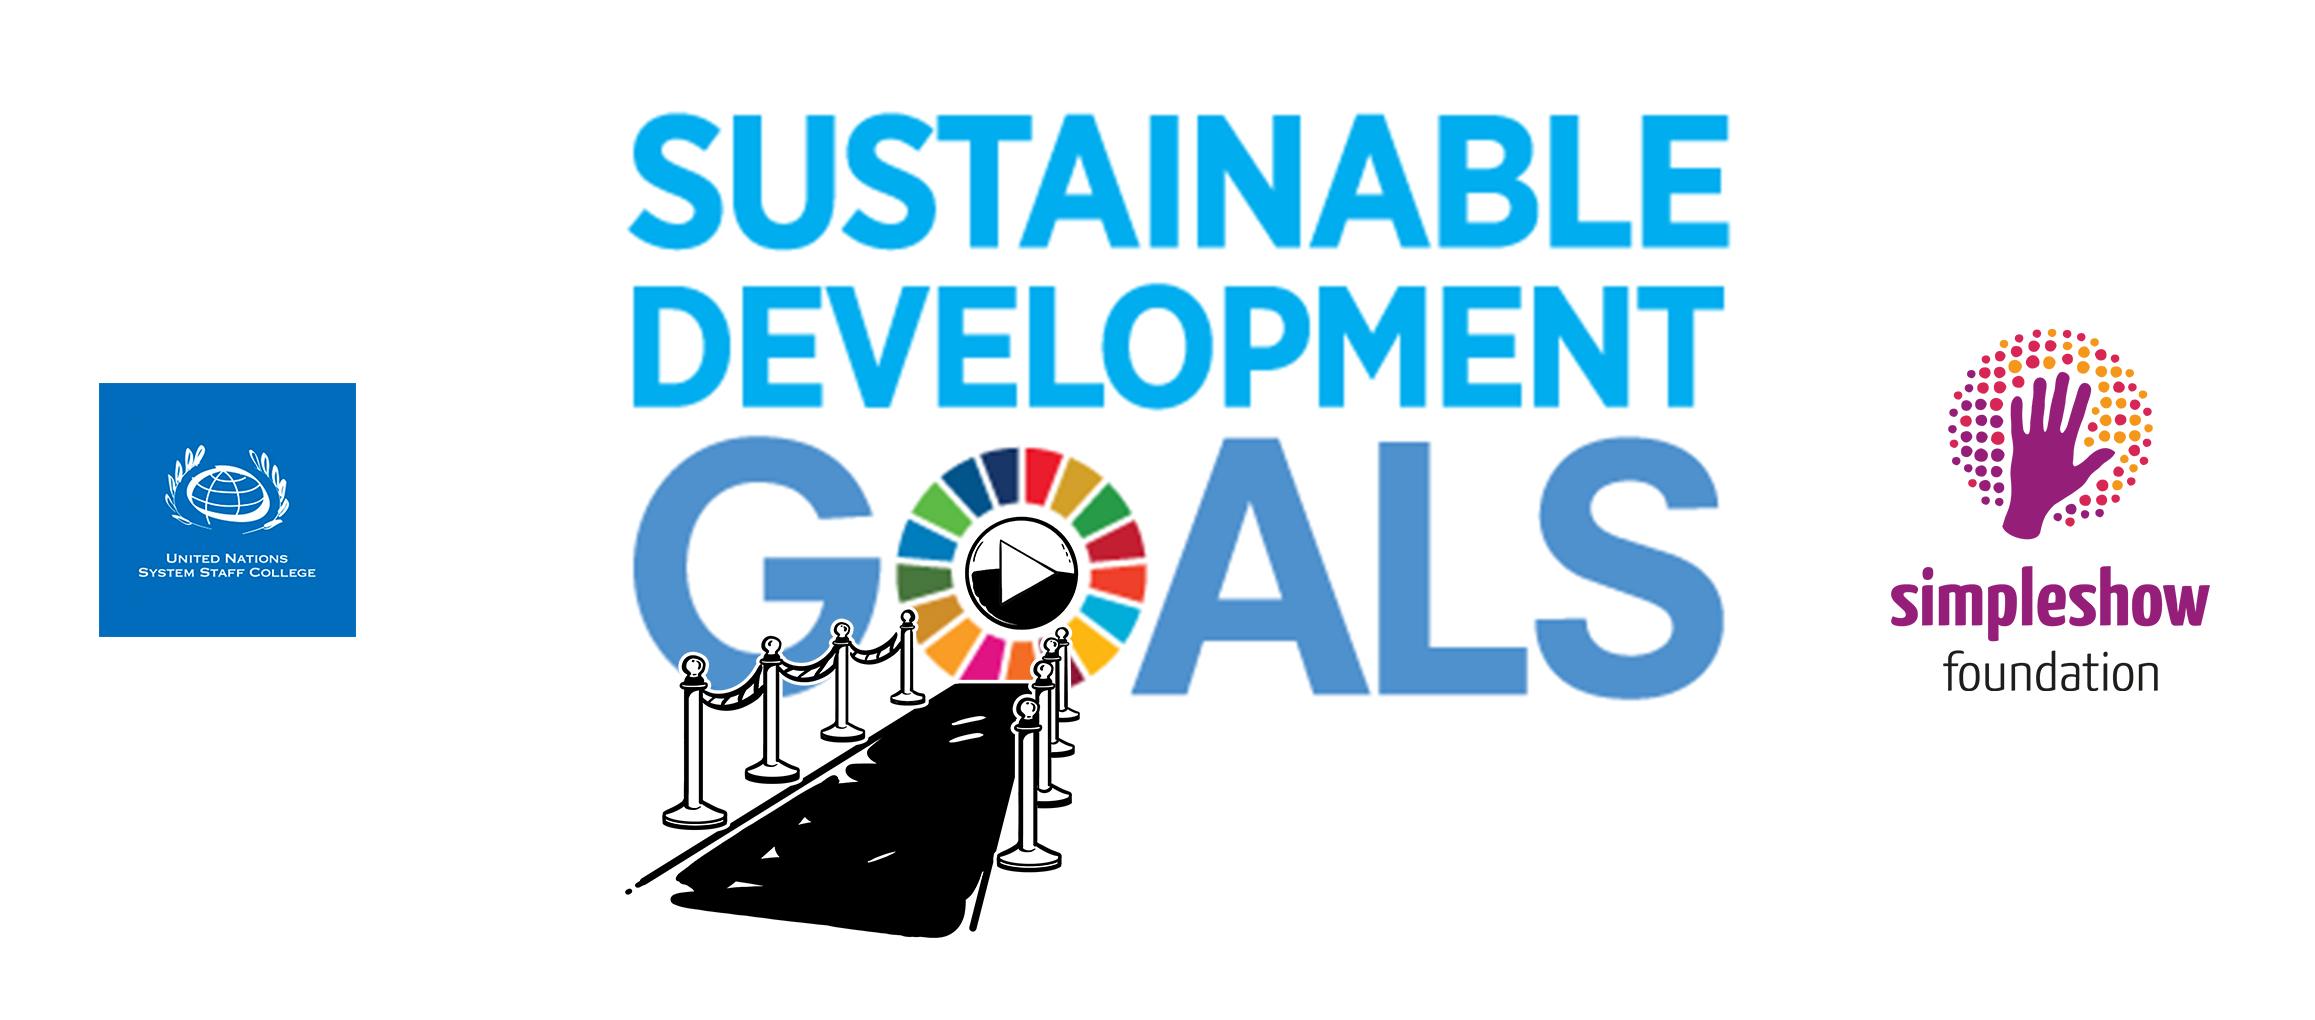 simpleshow foundation Sustainable Development Explainer Video Contest